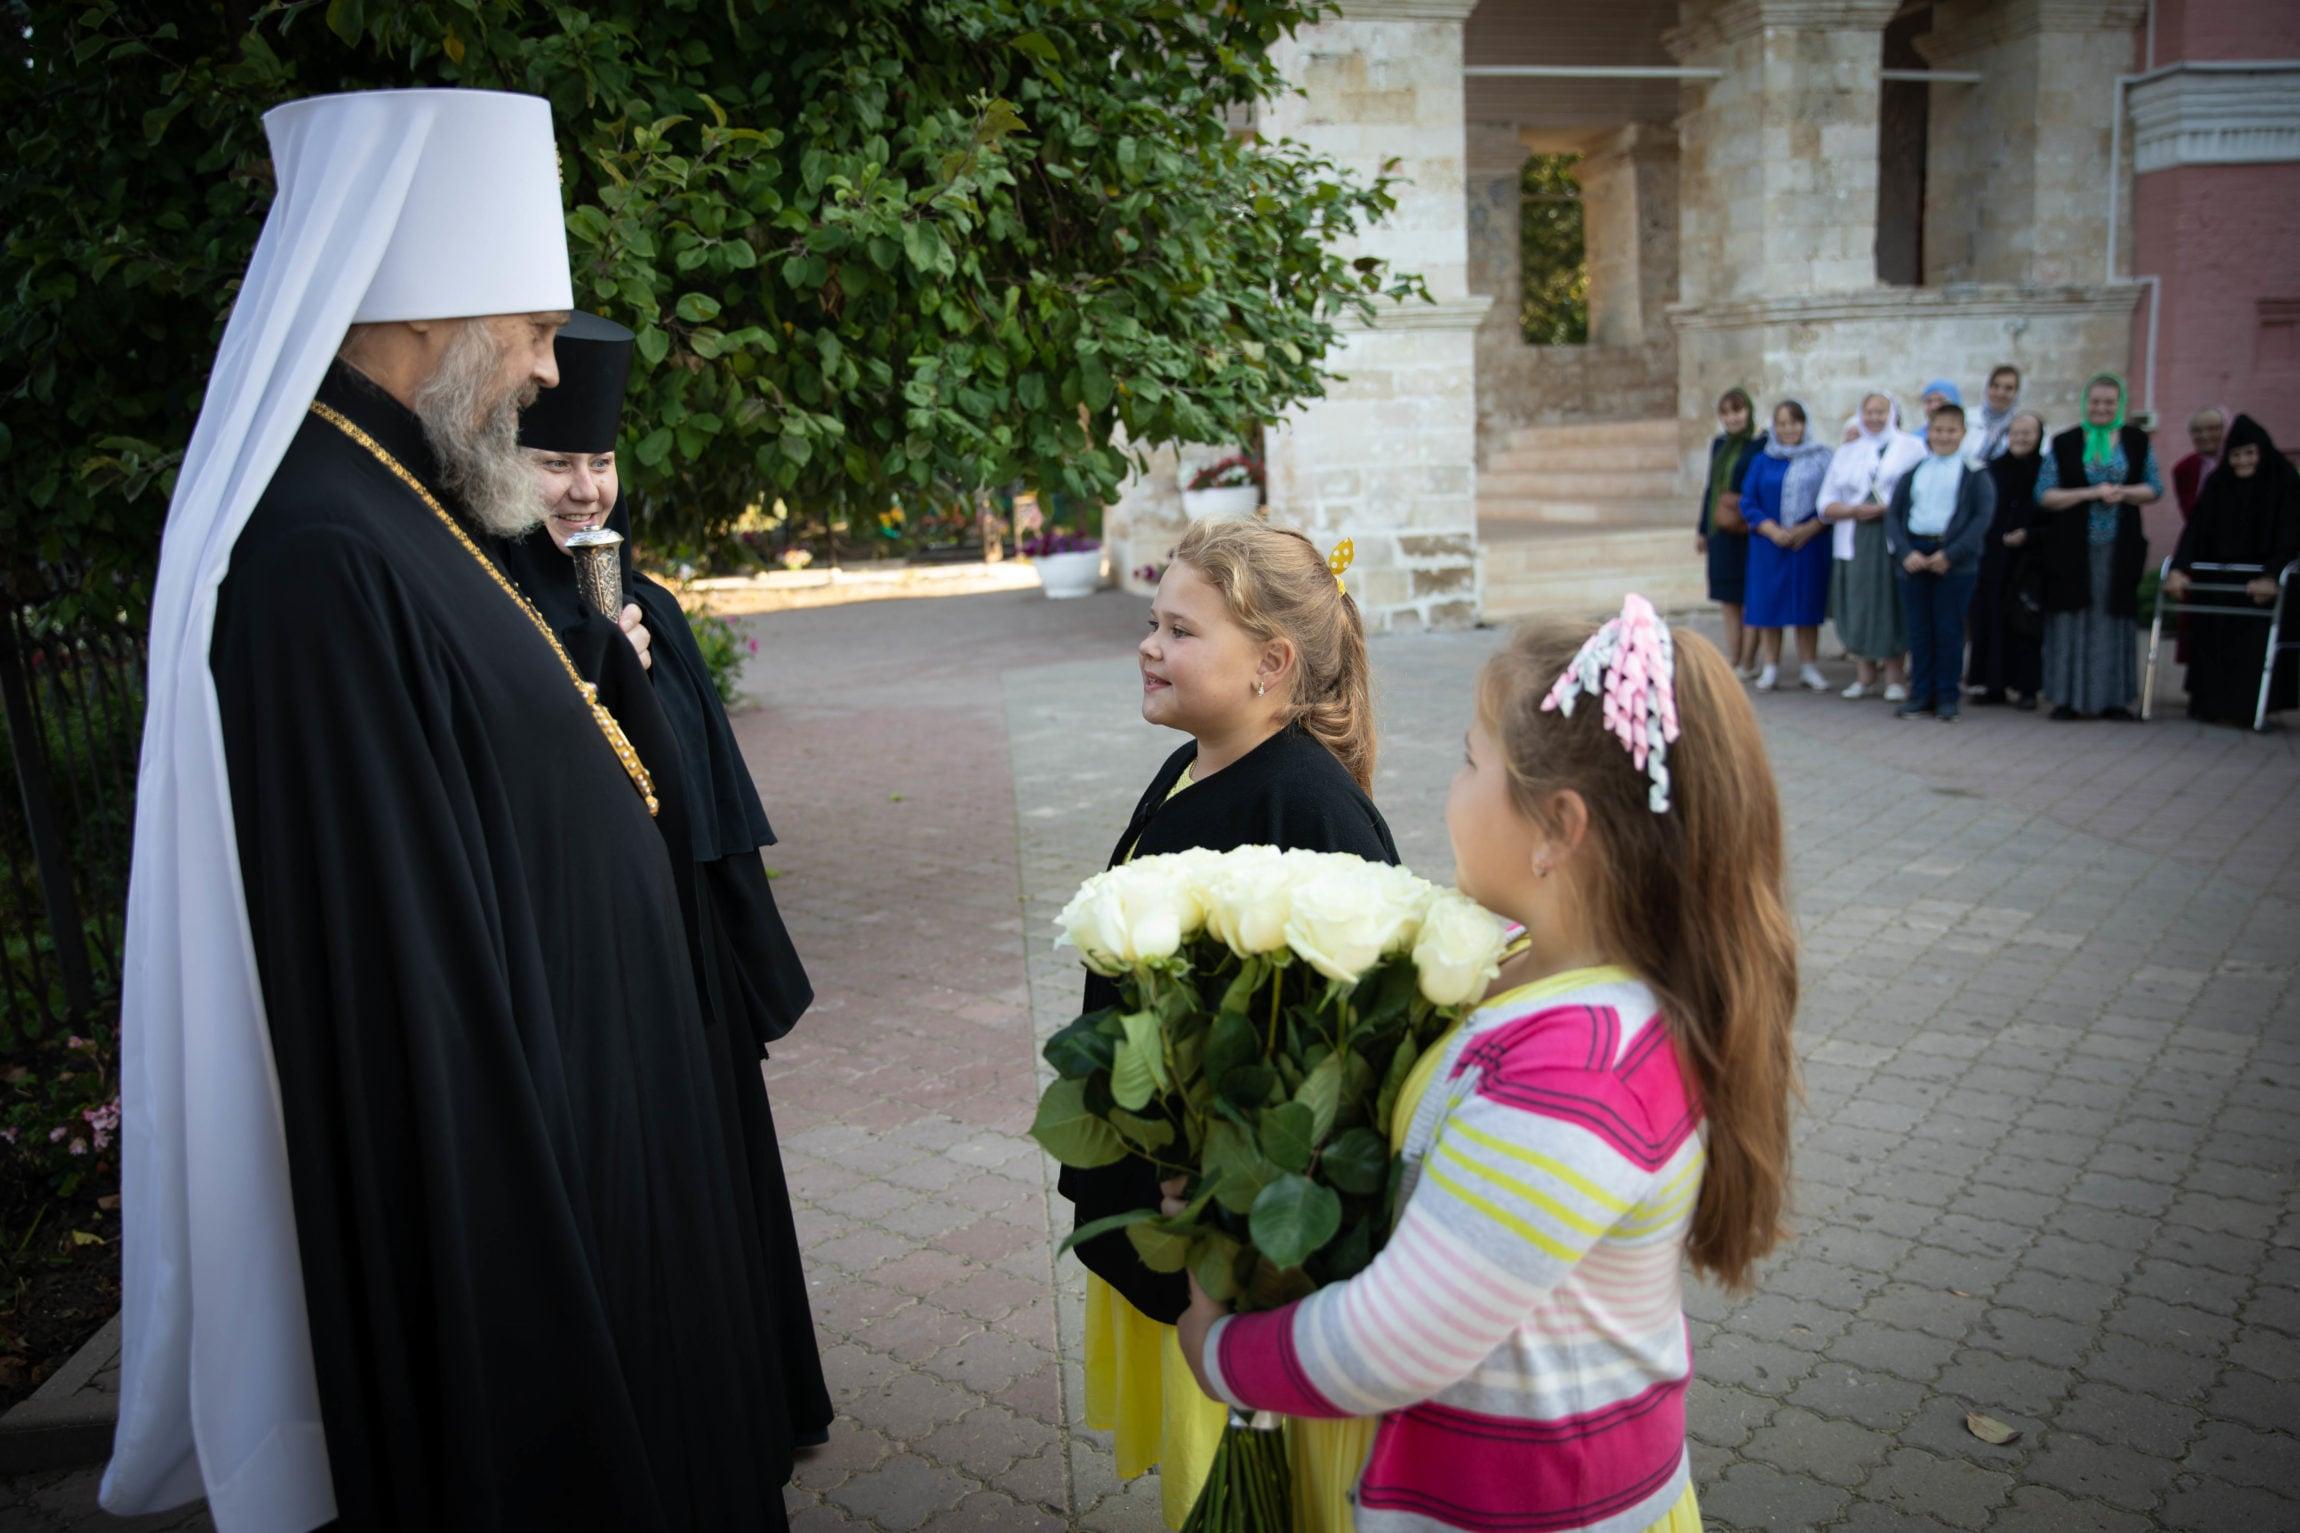 http://monuspen.ru/photoreports/143c0879173e3e11c82dee859362f215.jpg